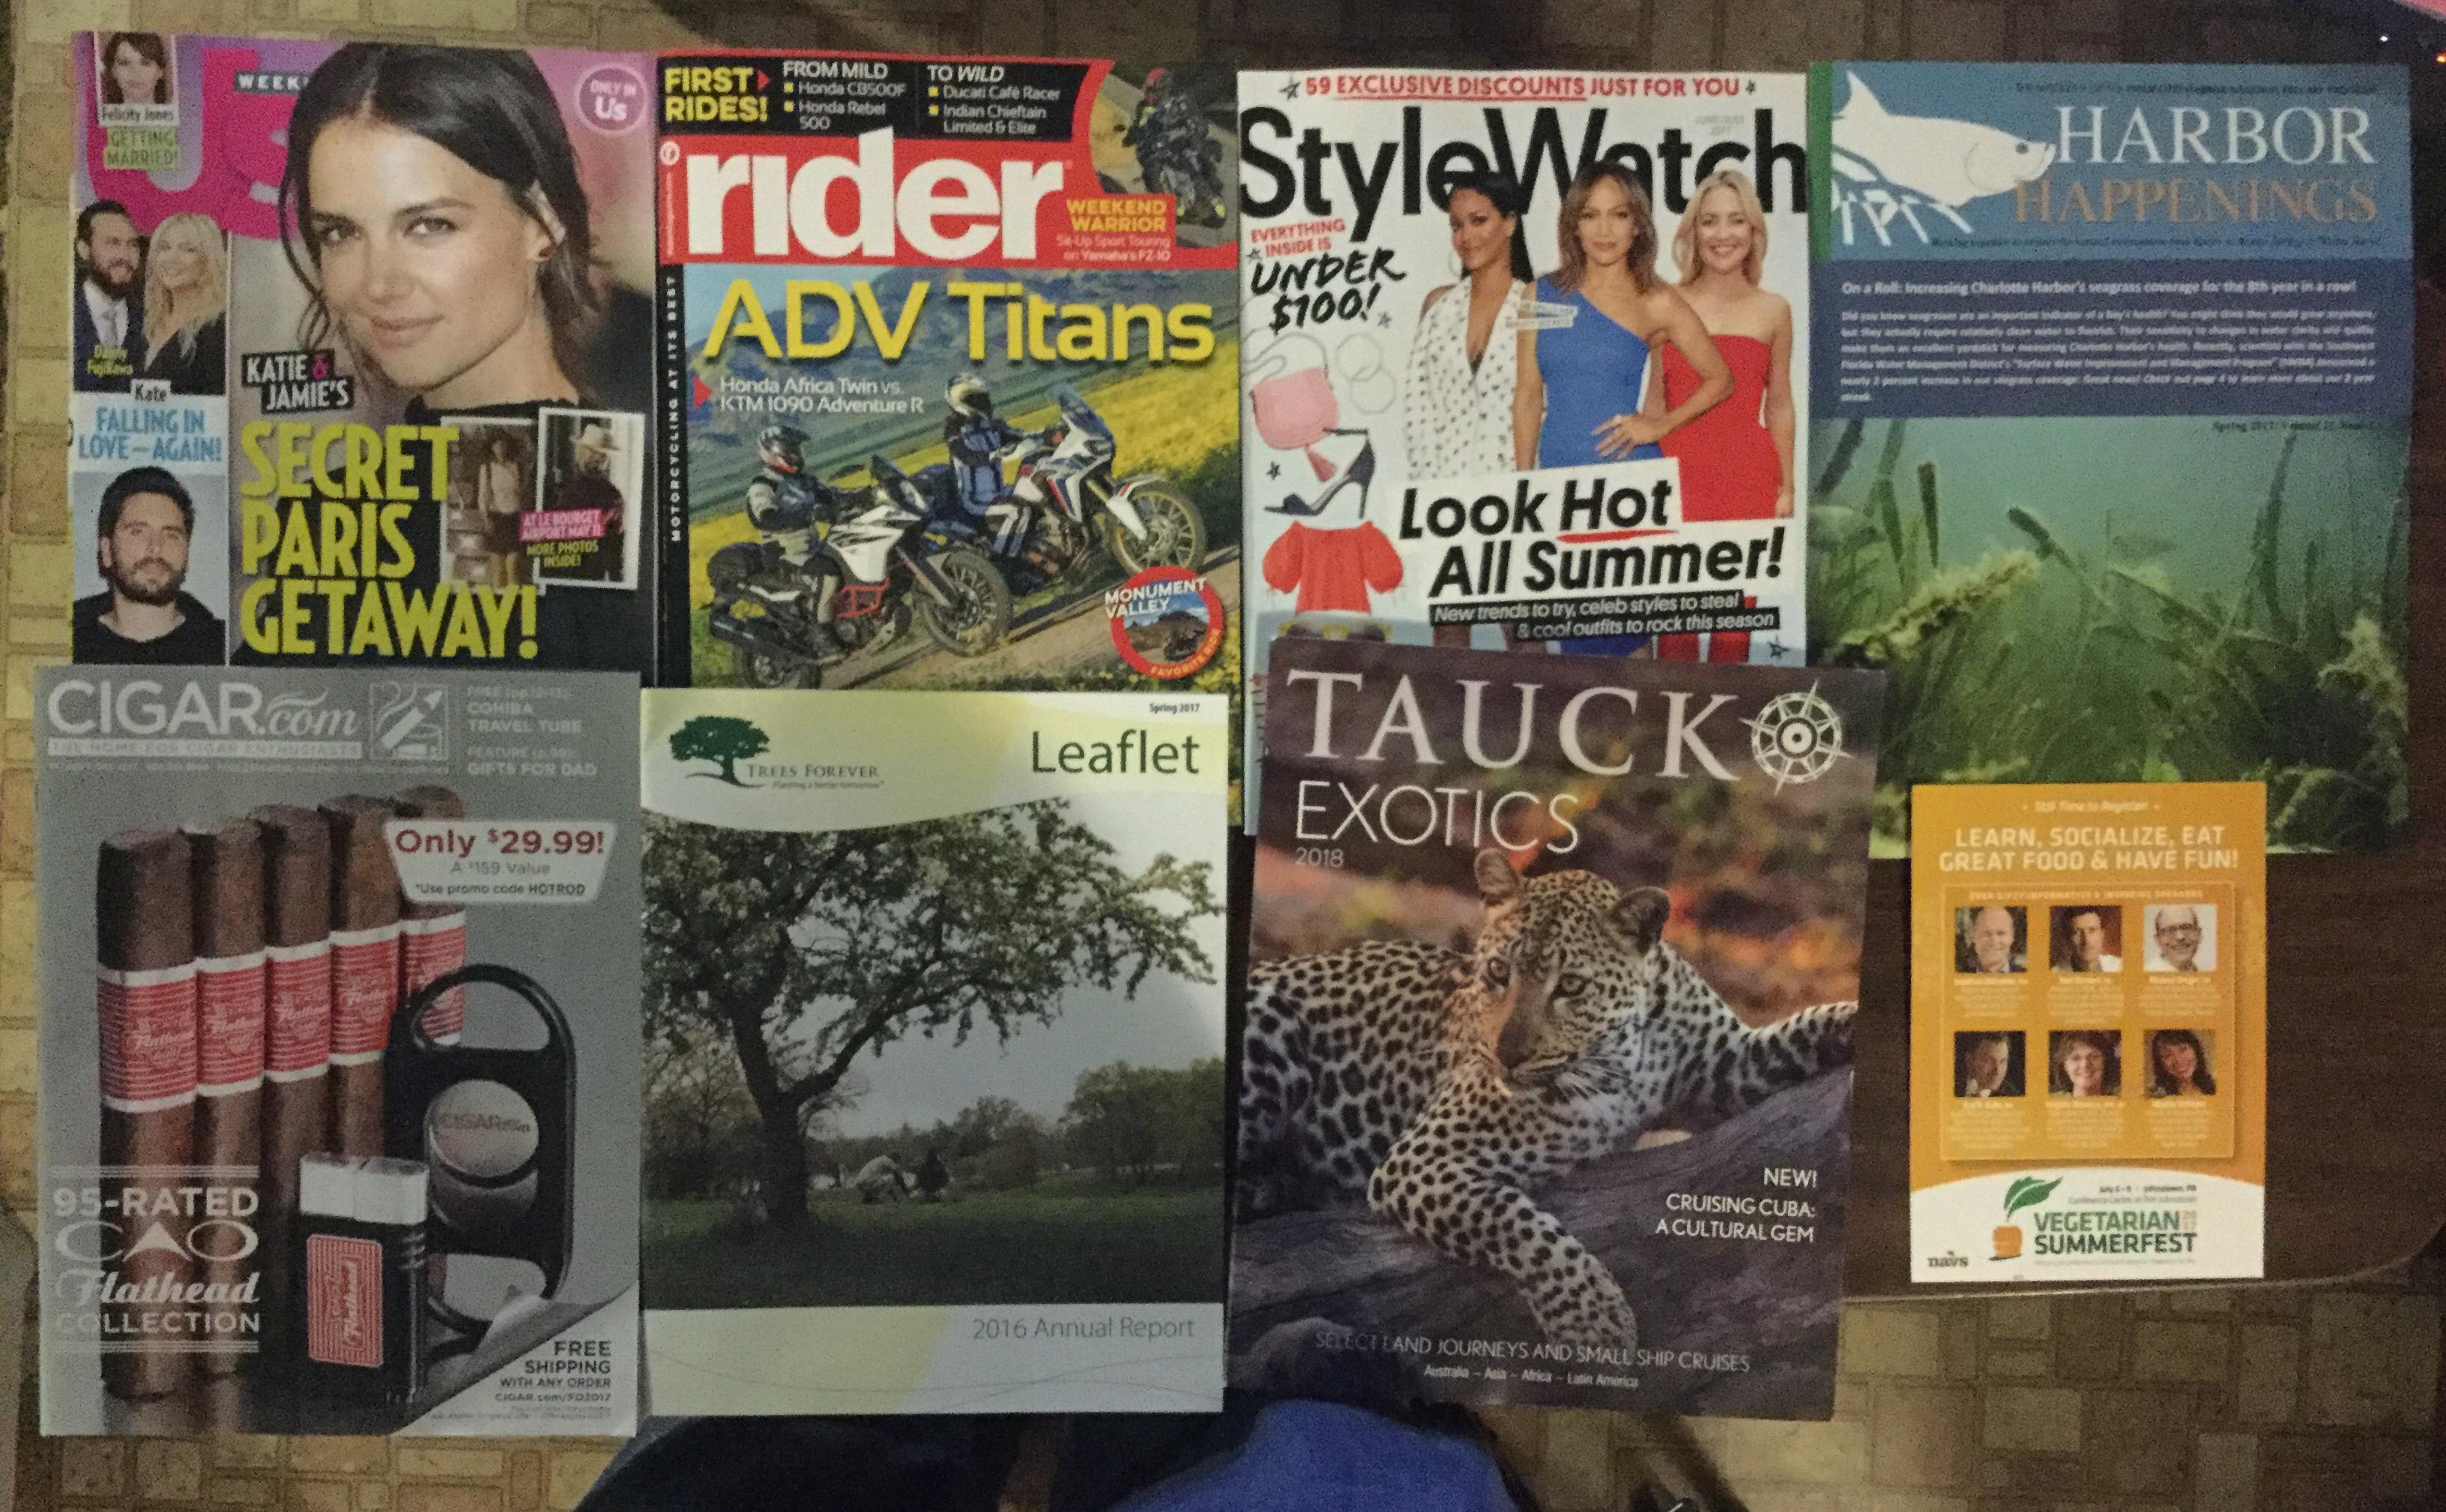 5 24 2017 Free Mail Us Weekly Rider